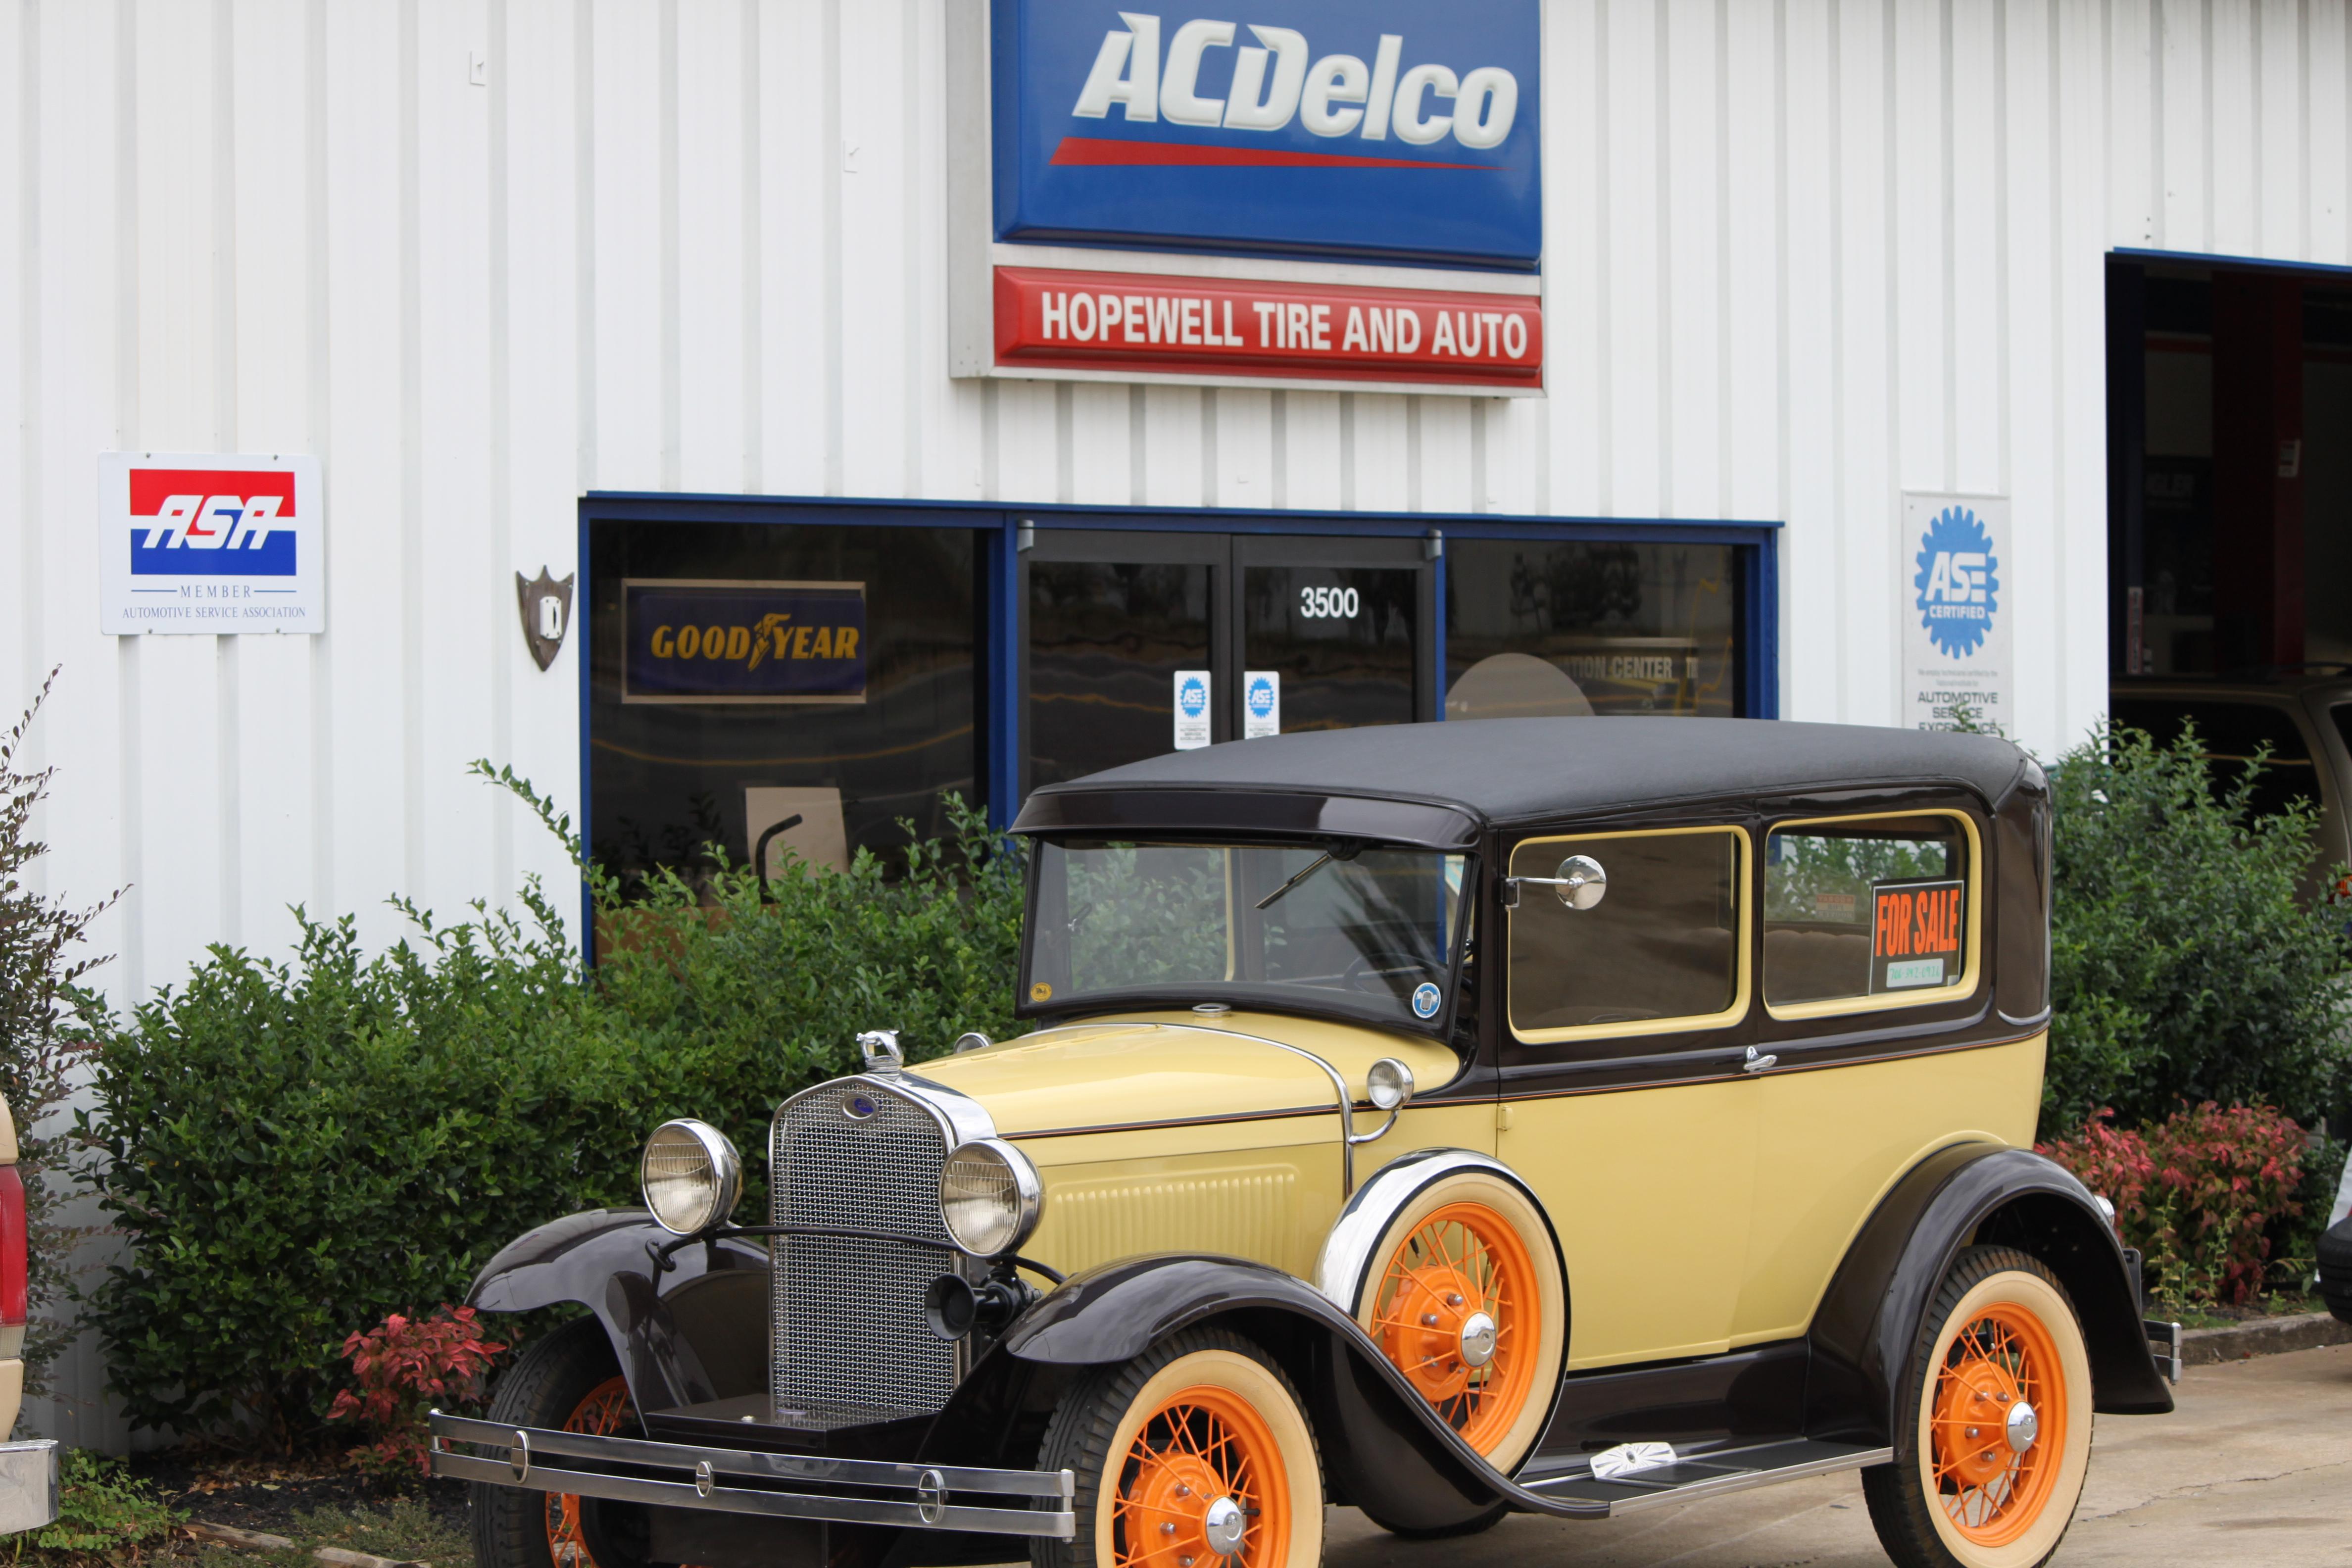 hopewell tire auto repair athens georgia ga. Black Bedroom Furniture Sets. Home Design Ideas